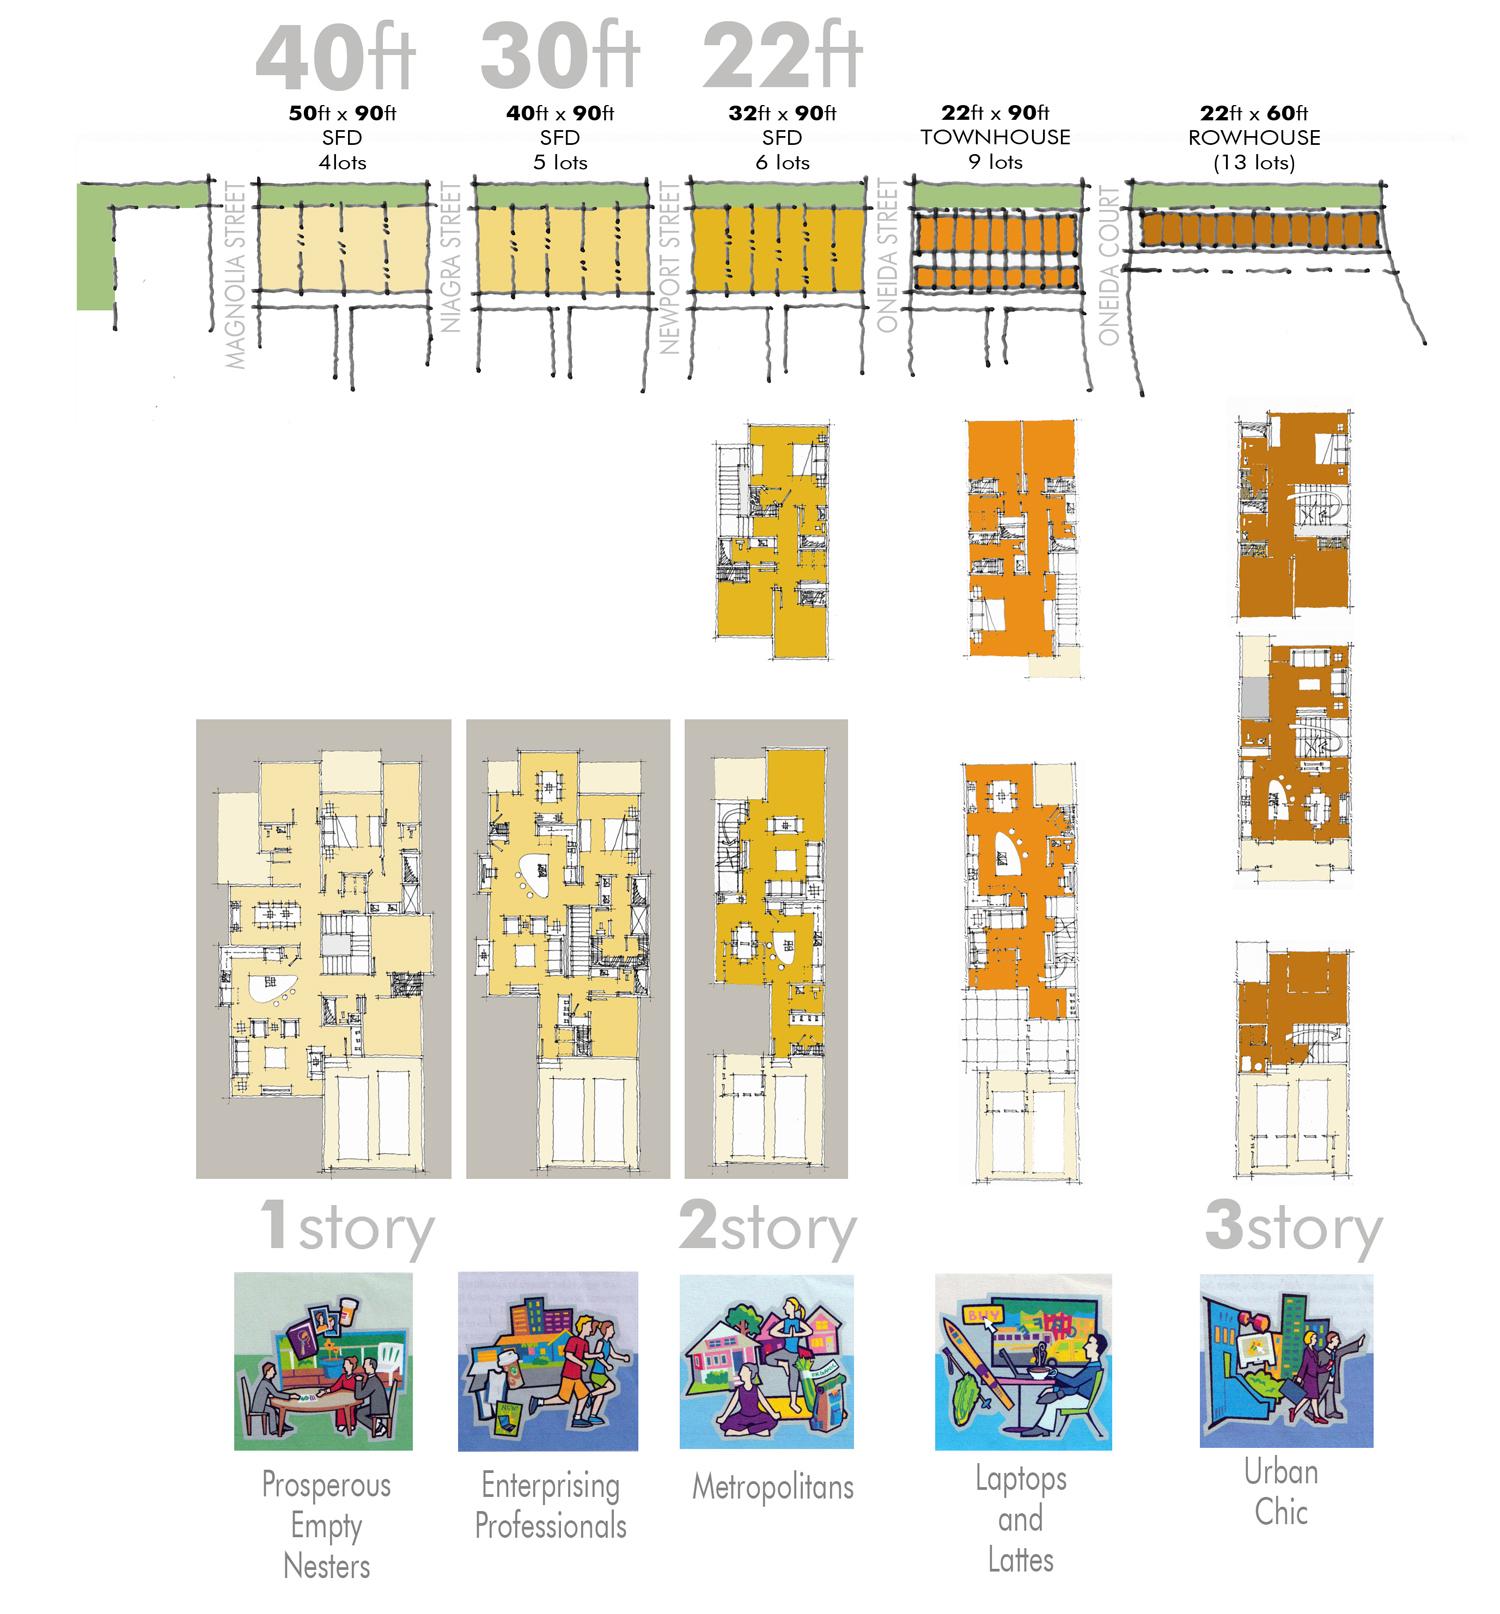 architecture marketesegmentation_1500.jpg